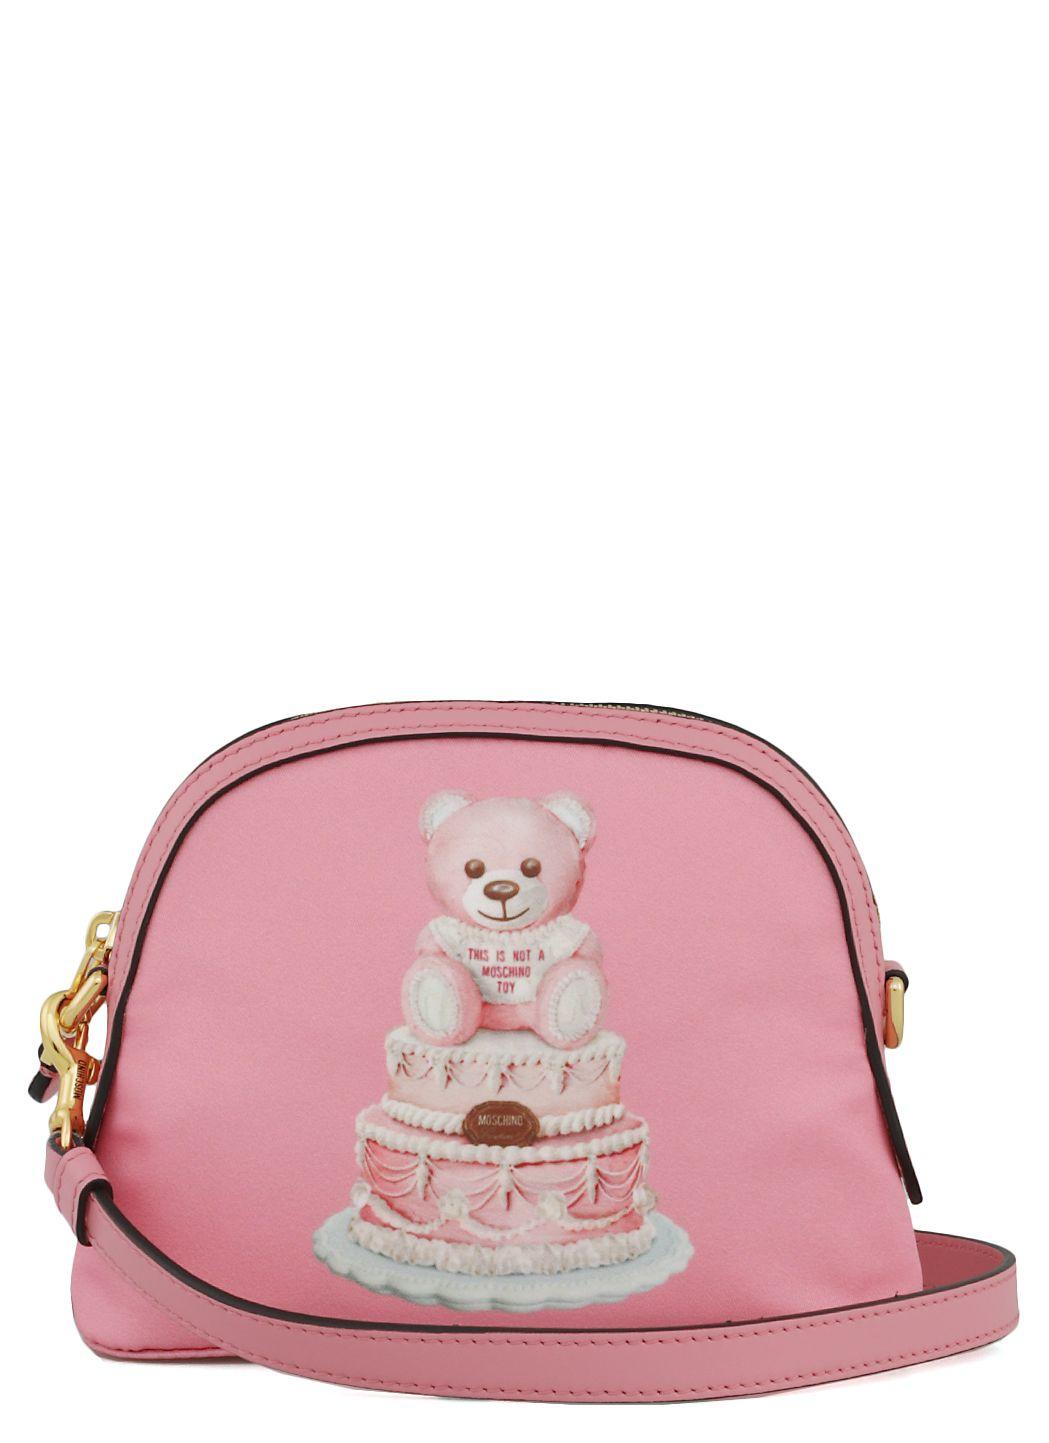 Pink Cake Teddy Bear borsa a spalla